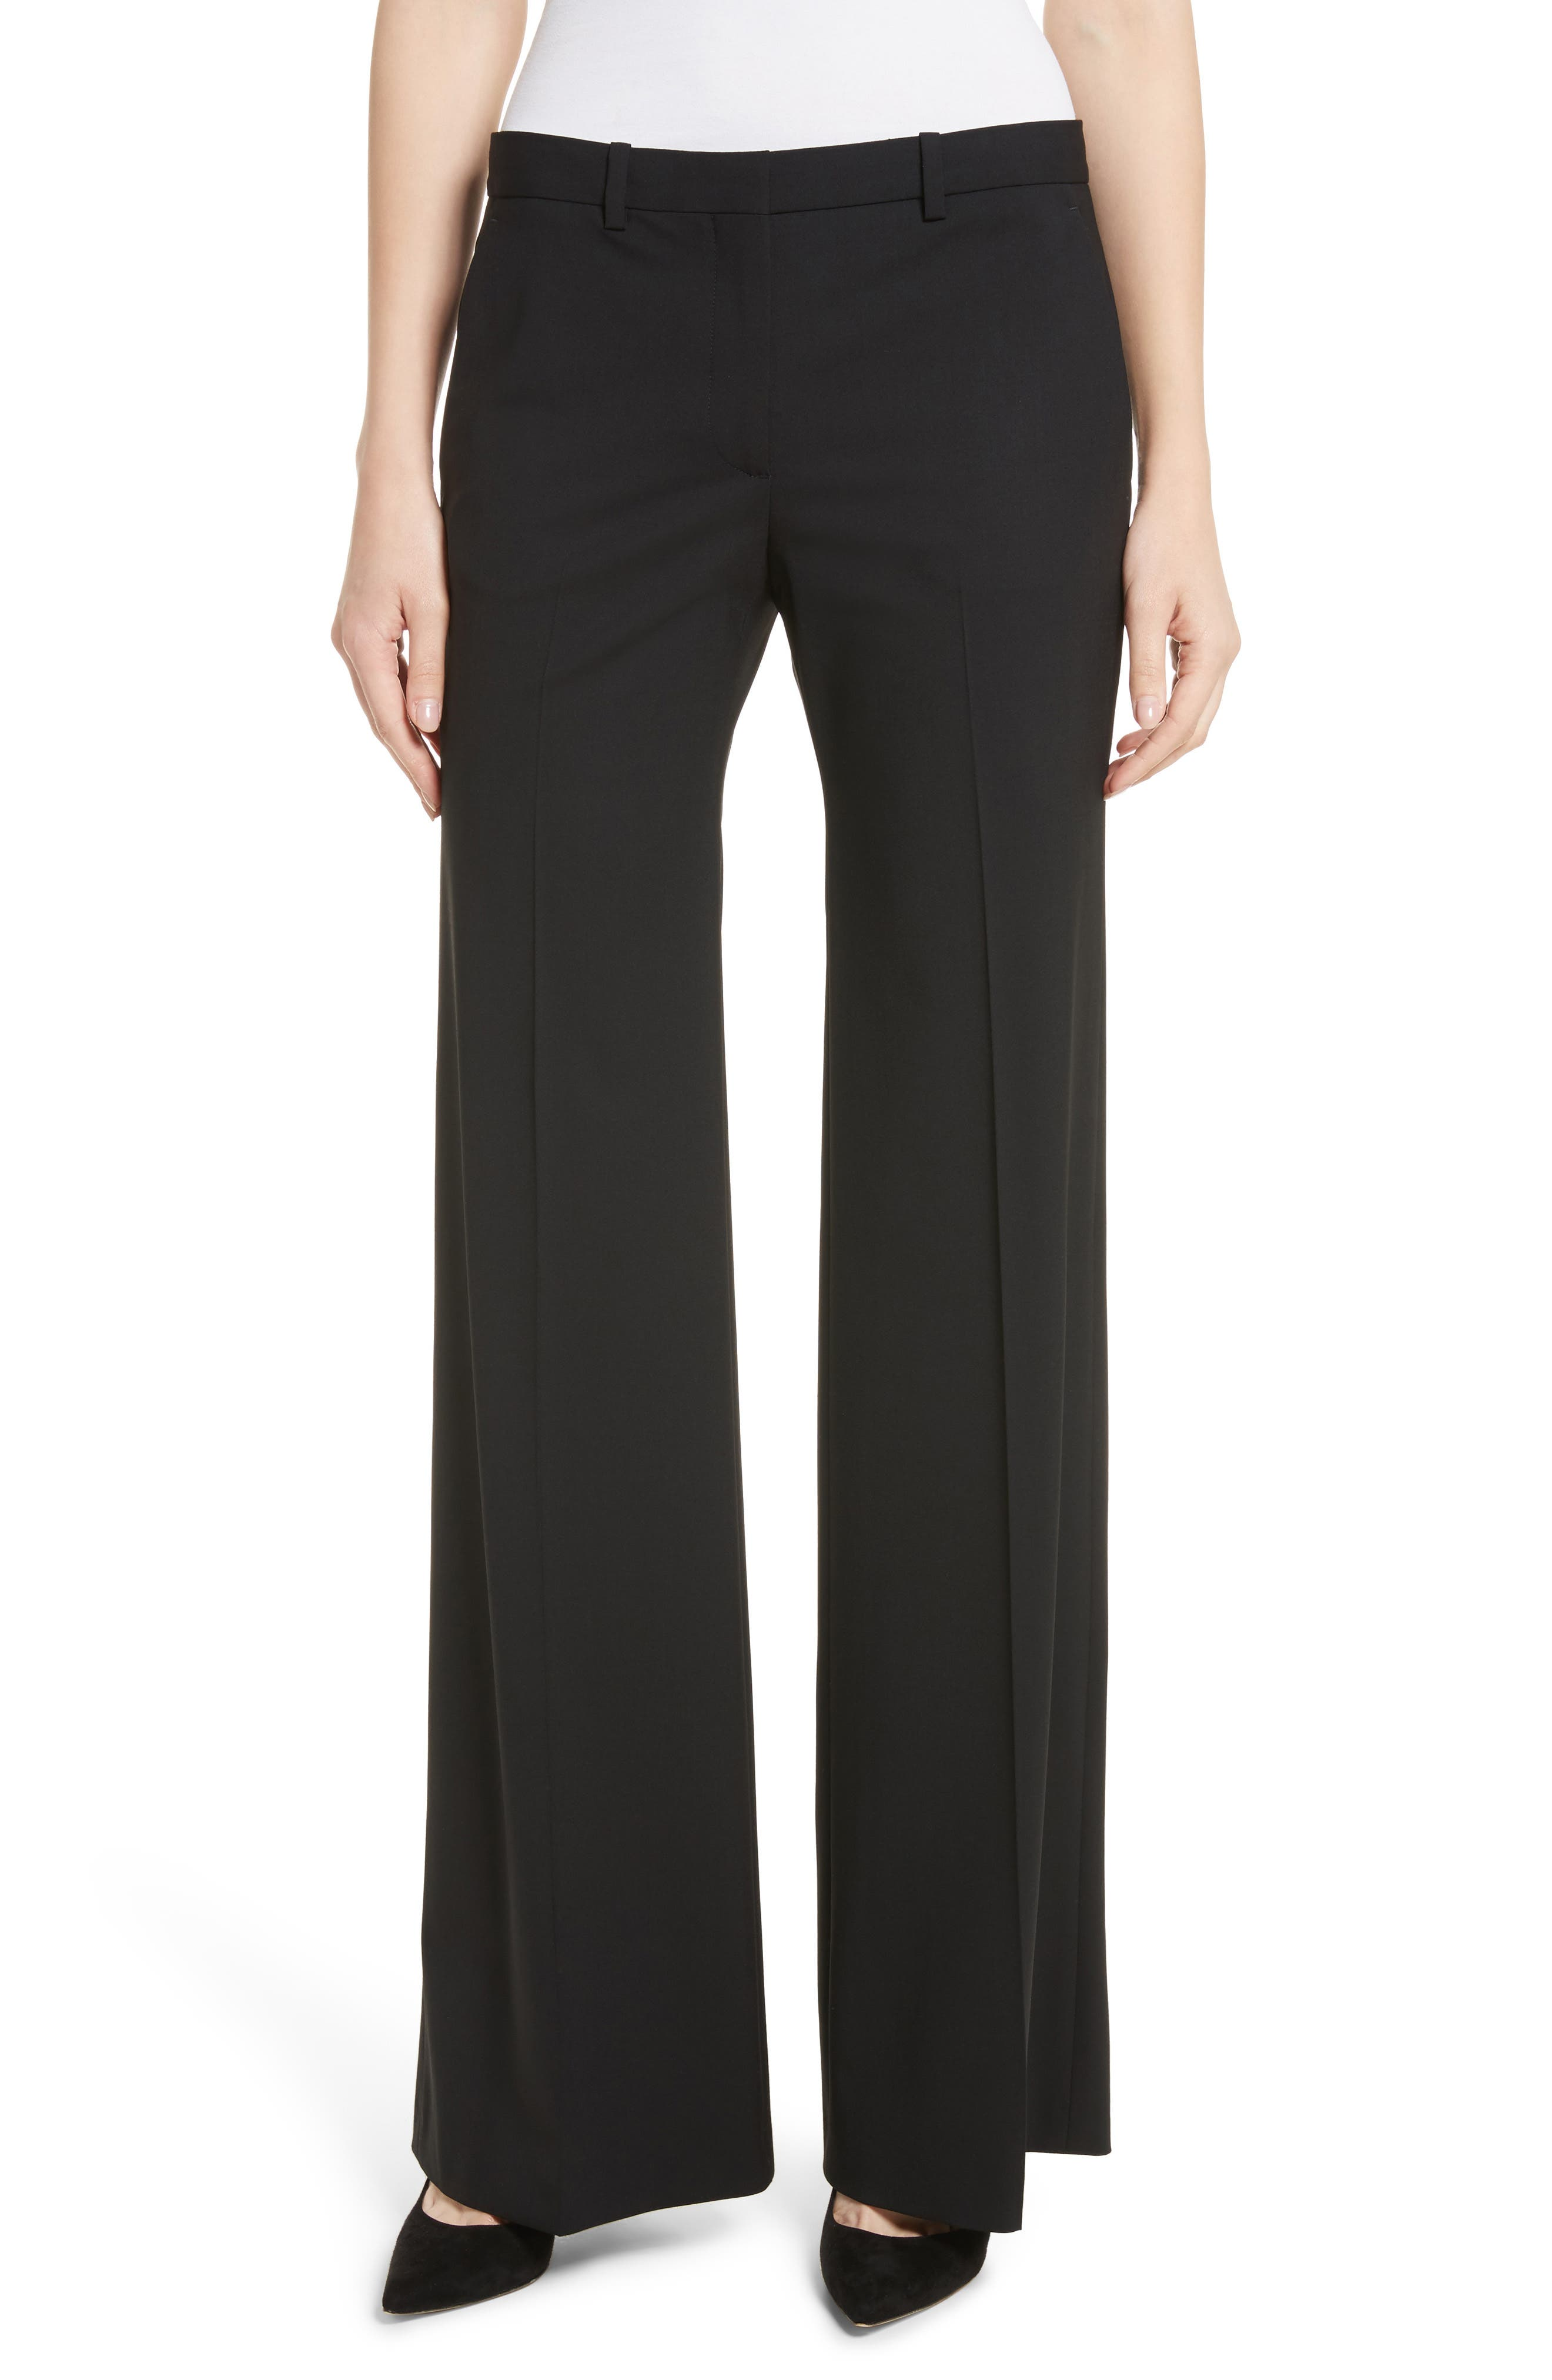 THEORY, Demetria 2 Flare Leg Good Wool Suit Pants, Main thumbnail 1, color, BLACK